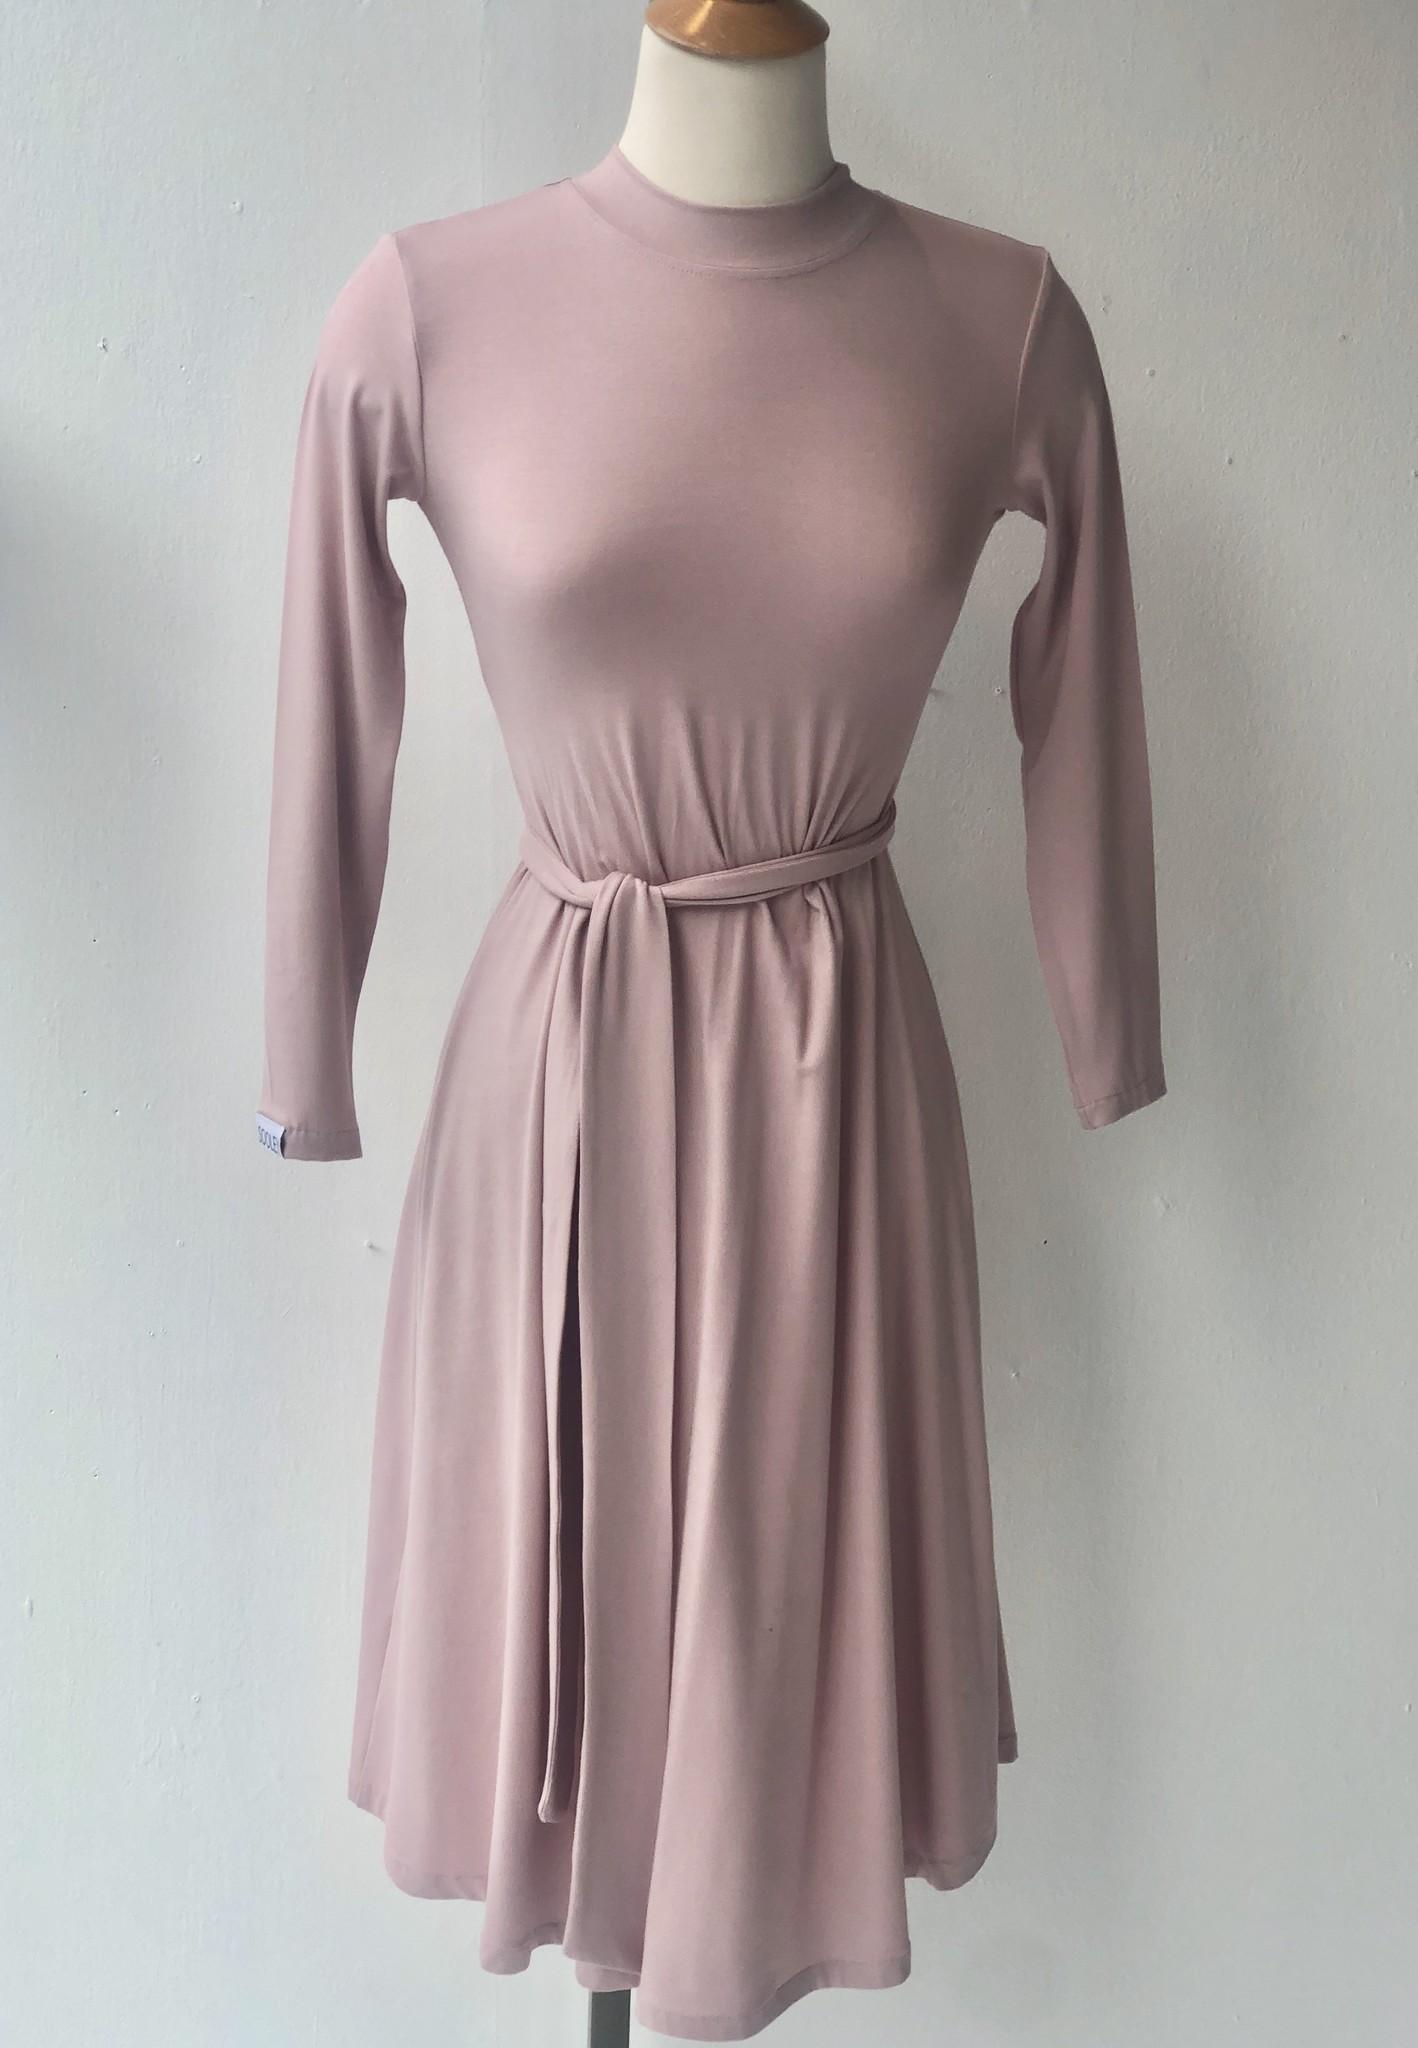 Sooley Designs Betty Dress - Bamboo